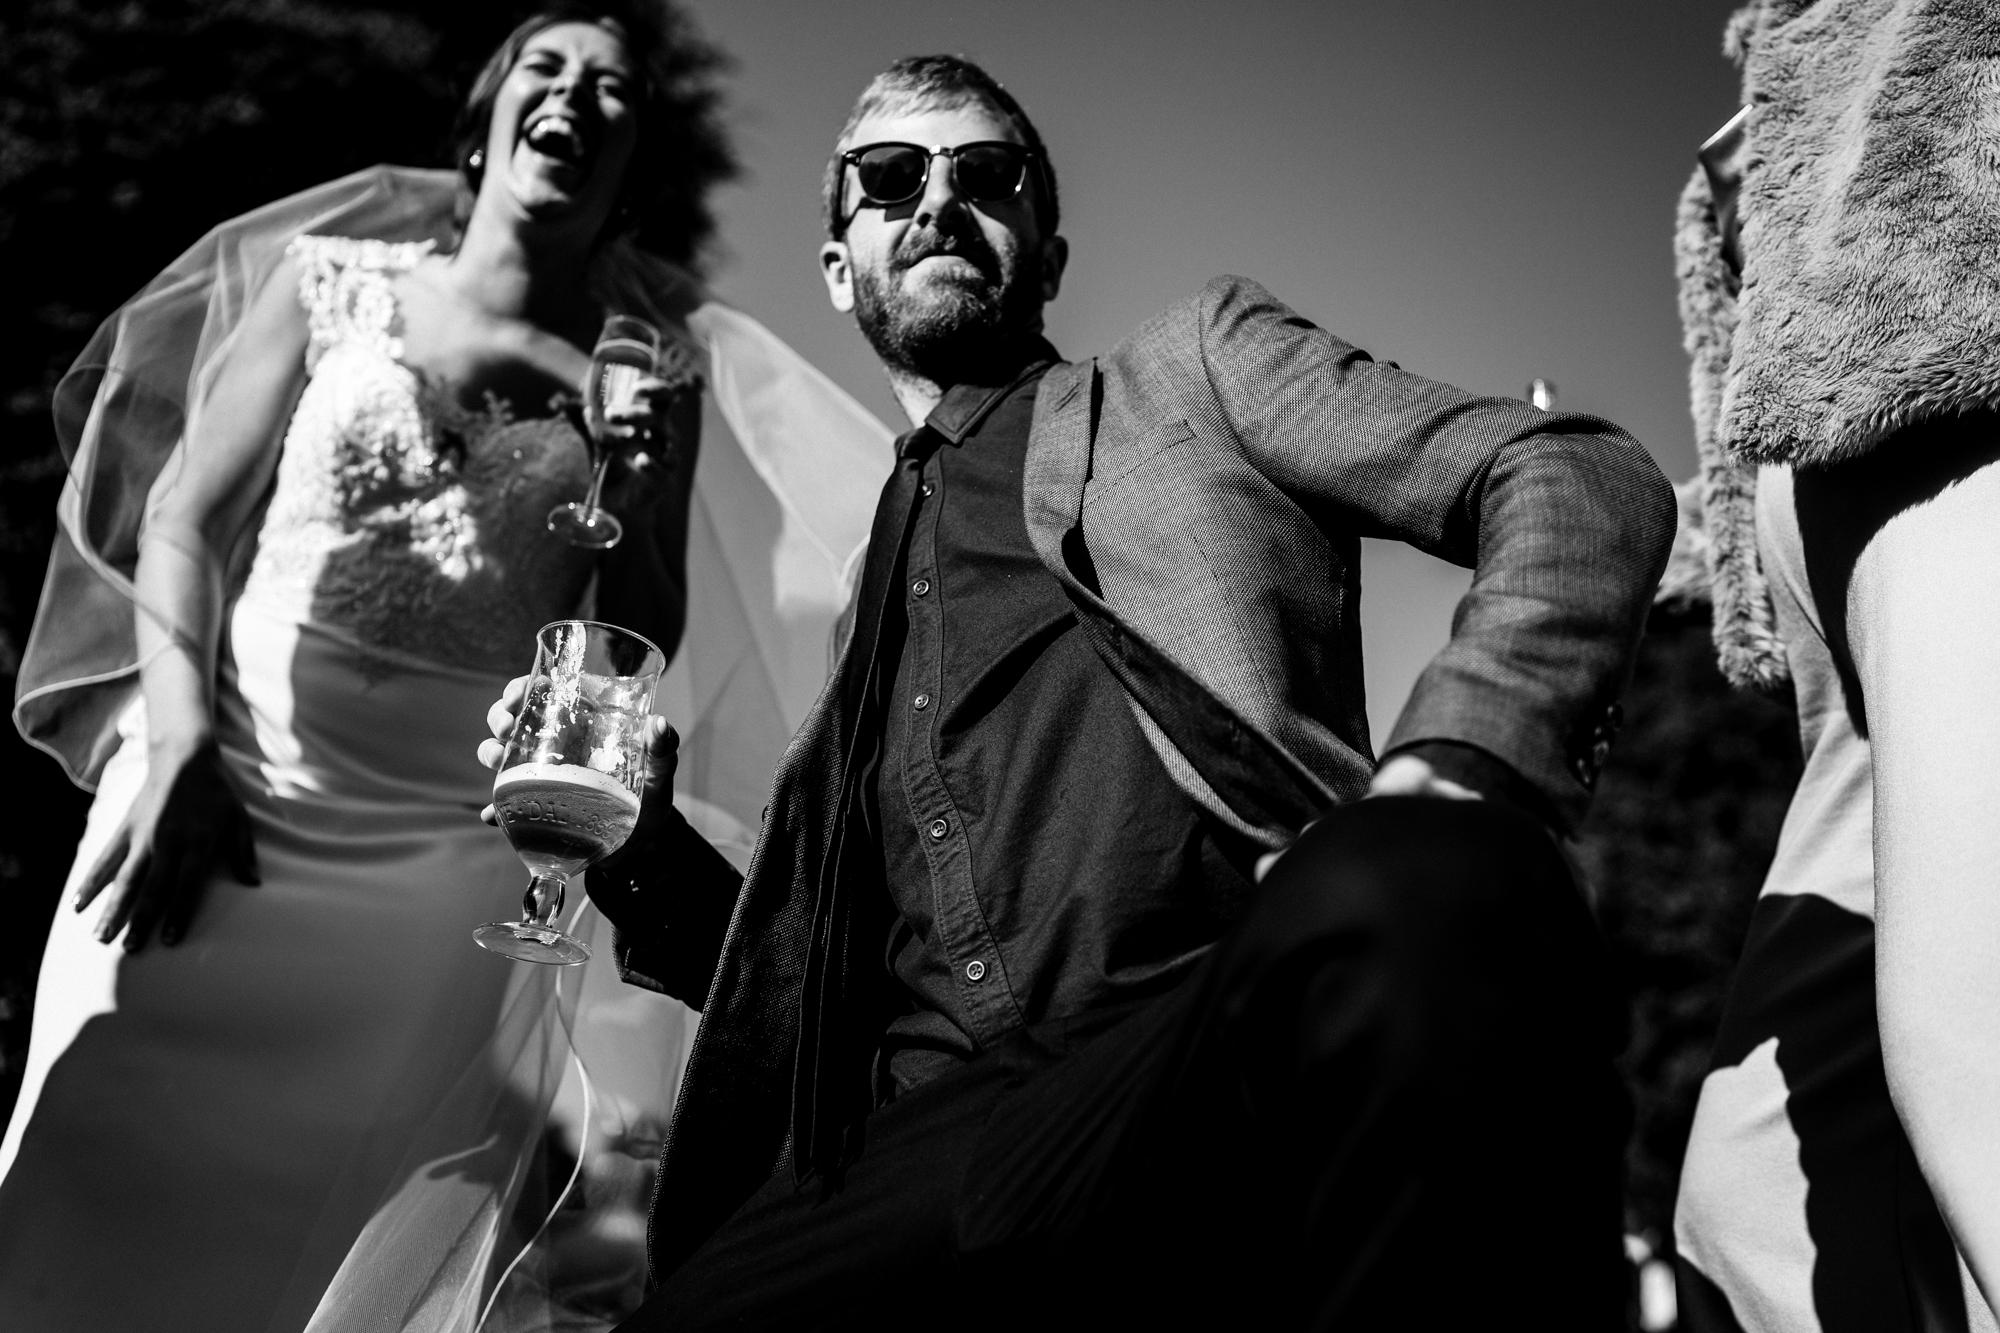 Rivington Hall Barn Wedding Photography lancashire wedding photographer (35 of 45).jpg